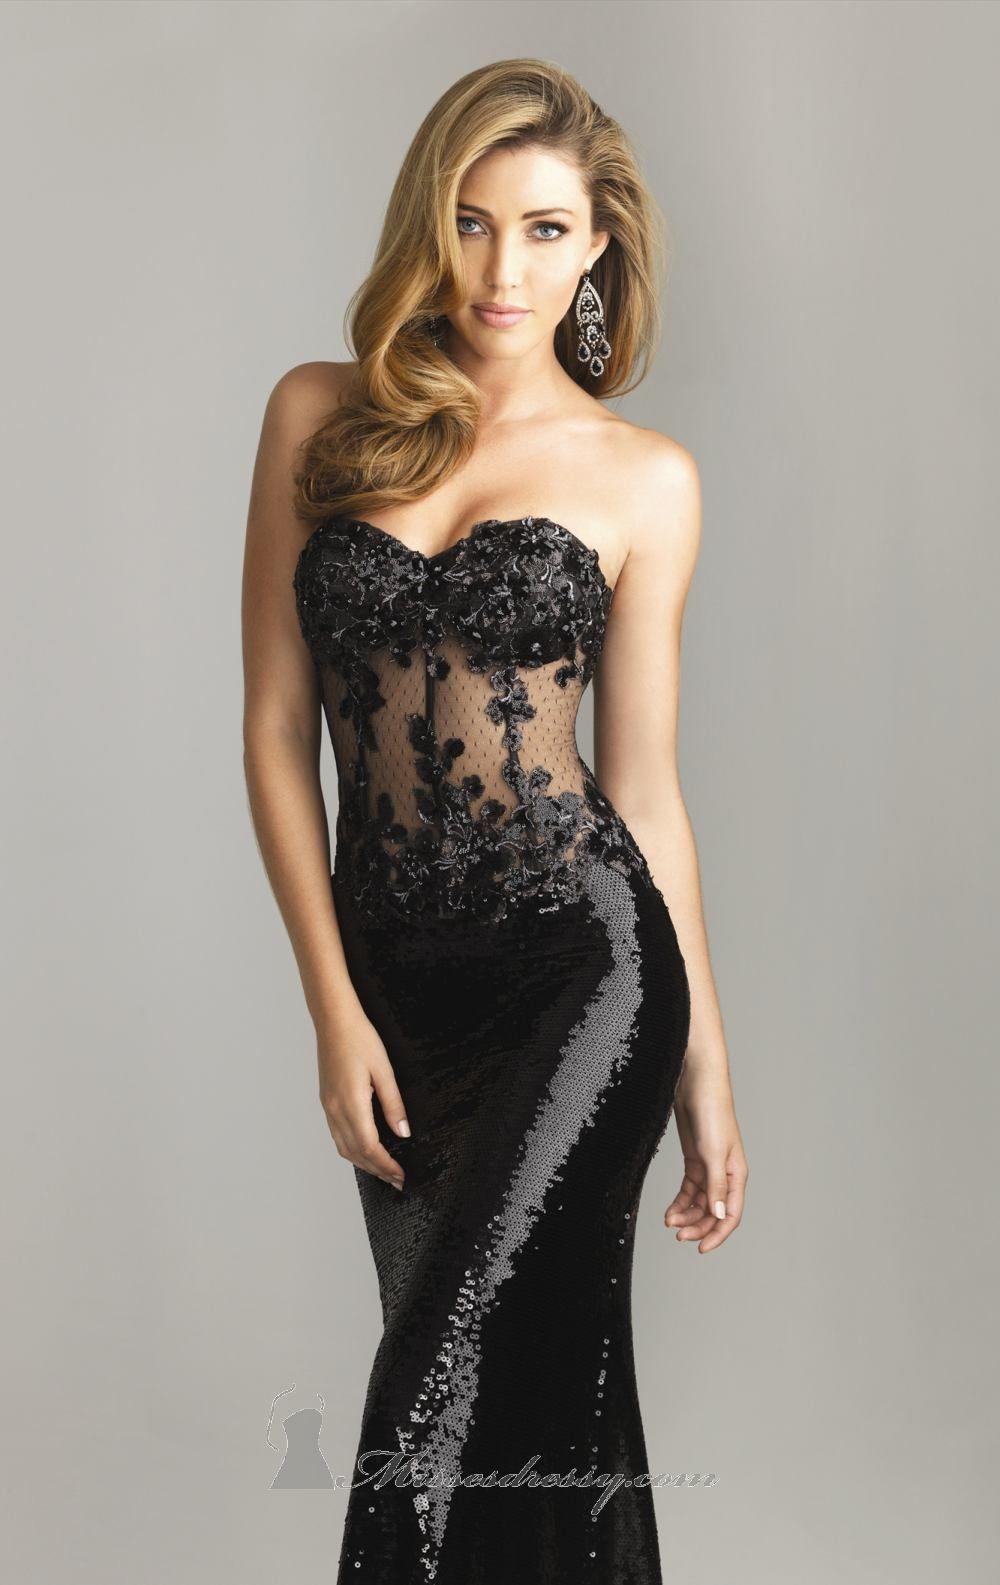 e46dceef2c02 18 Stunning Evening Gowns - Fashion Diva Design   Dress Me Up: Night ...